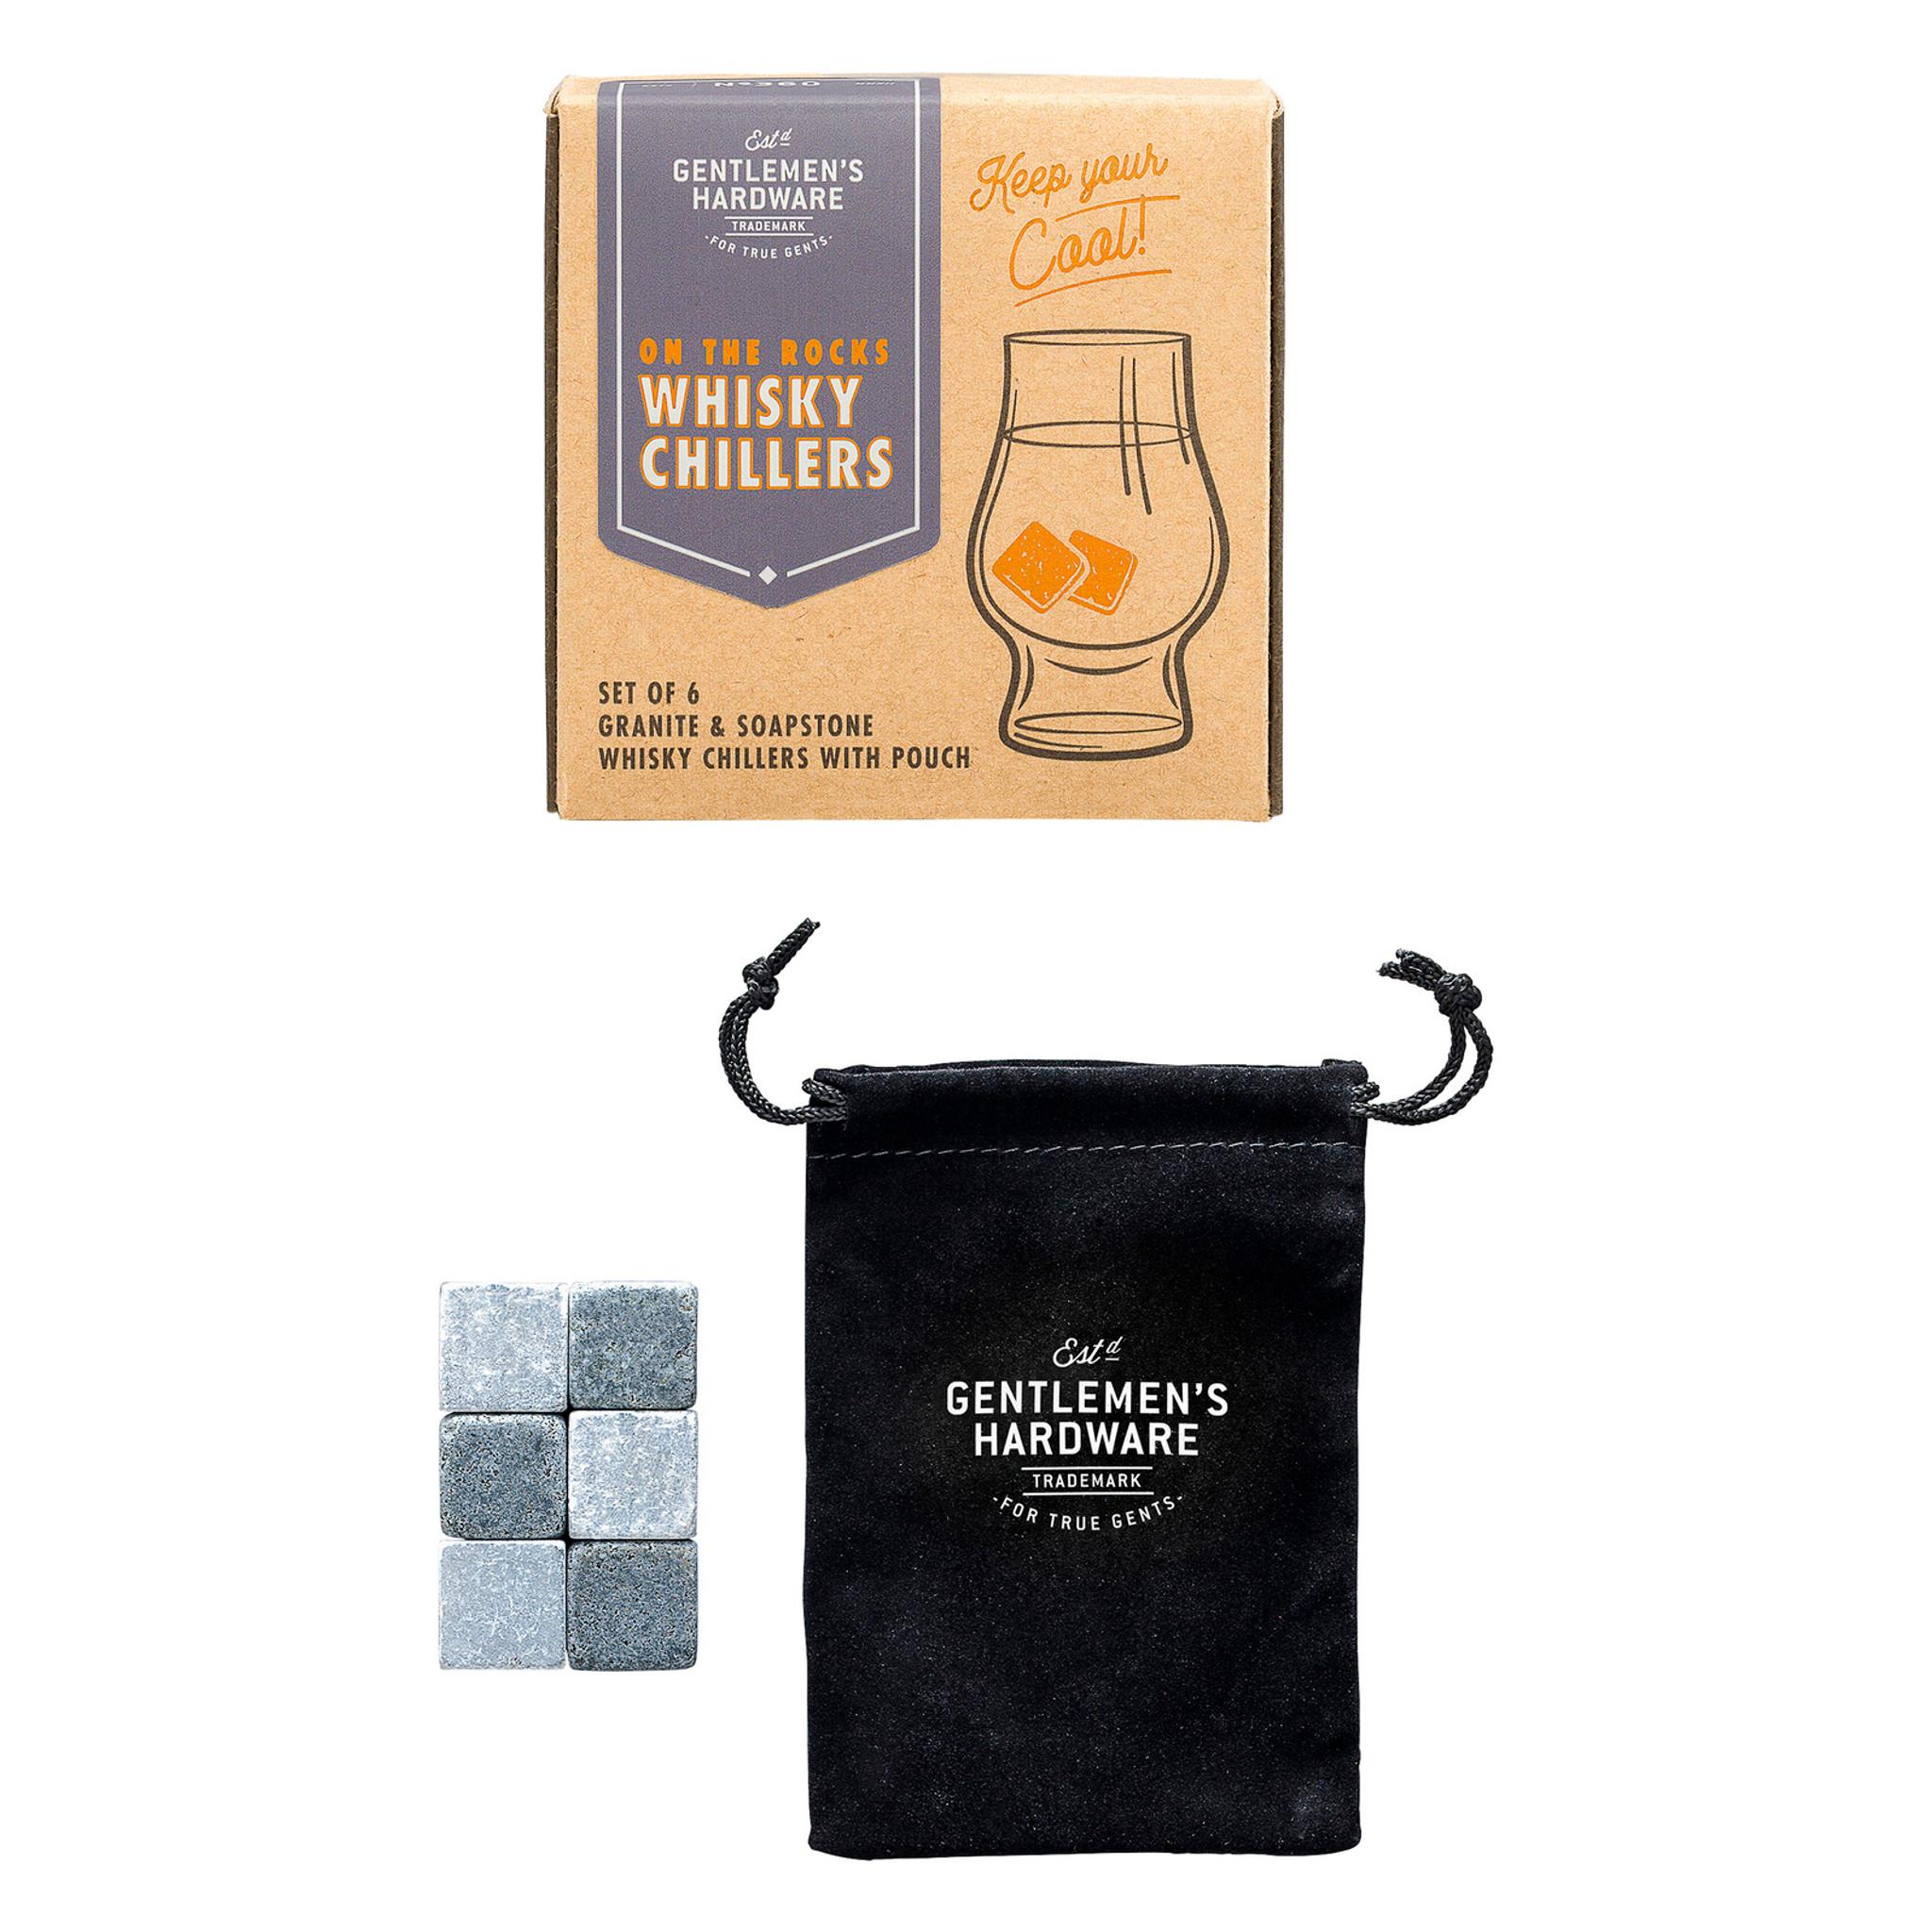 Whisky Chillers (set 6) - Gentlemen's Hardware